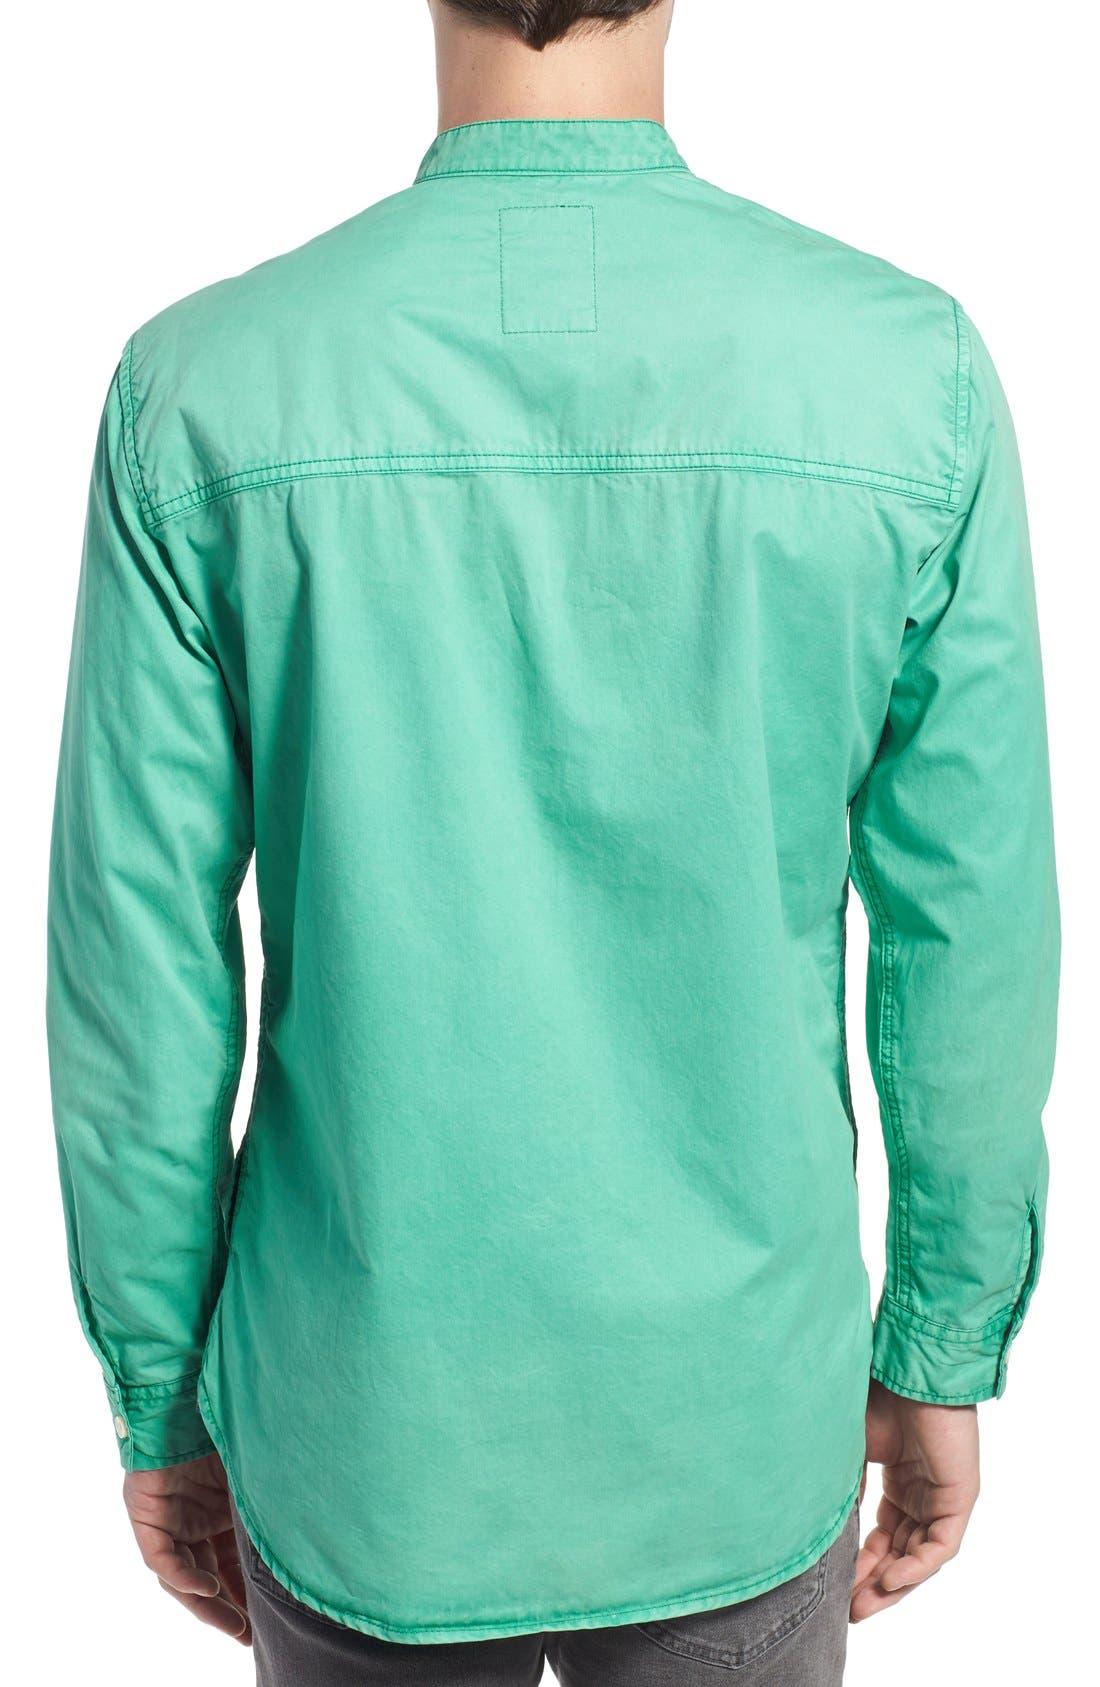 'Cotinga' Extra Trim Fit Band Collar Woven Shirt,                             Alternate thumbnail 3, color,                             300